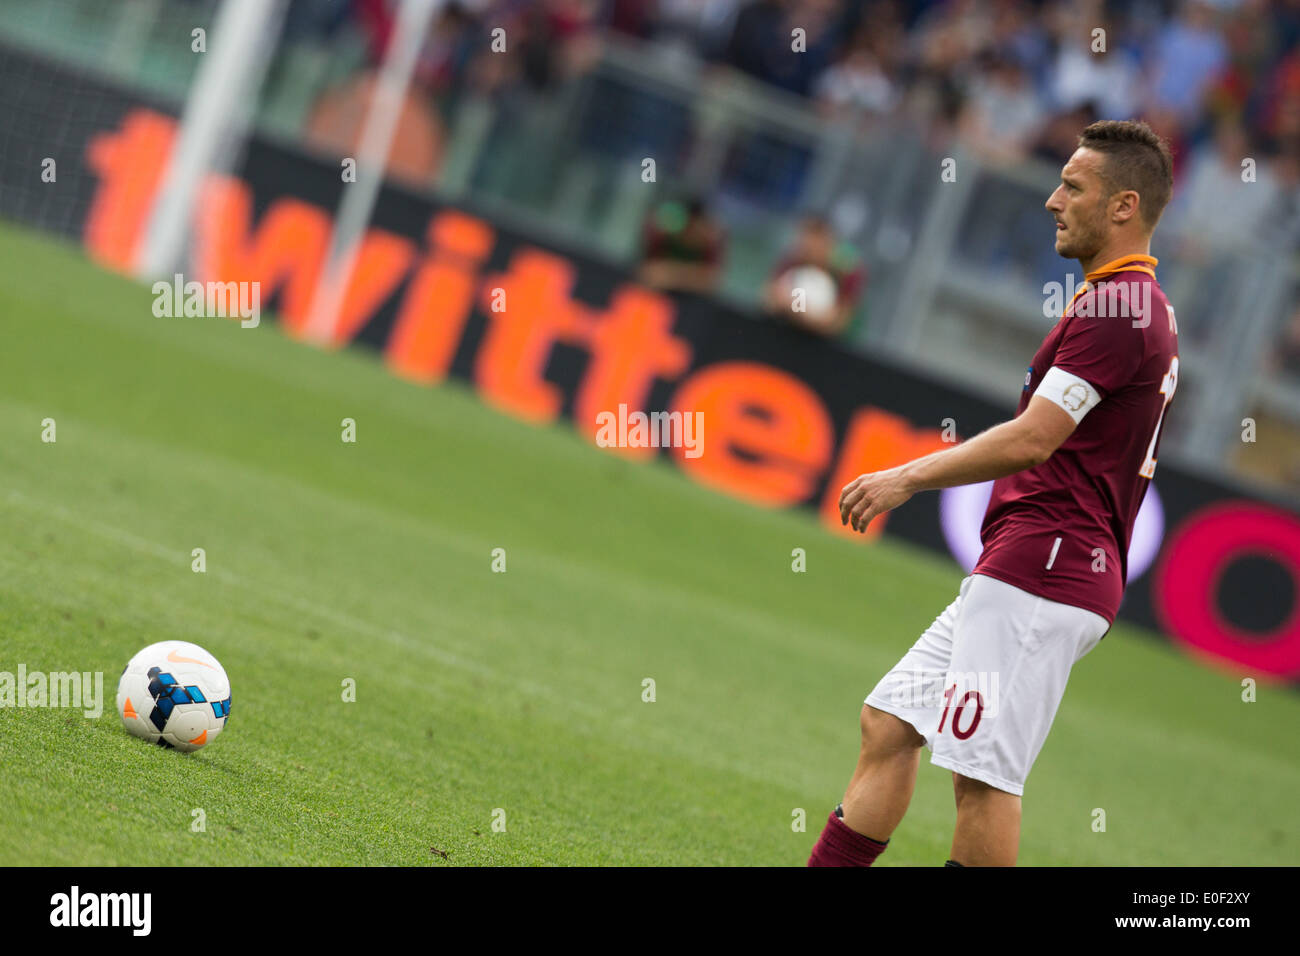 7a14cb01c8746 Francesco Totti Stock Photos   Francesco Totti Stock Images - Page 3 ...